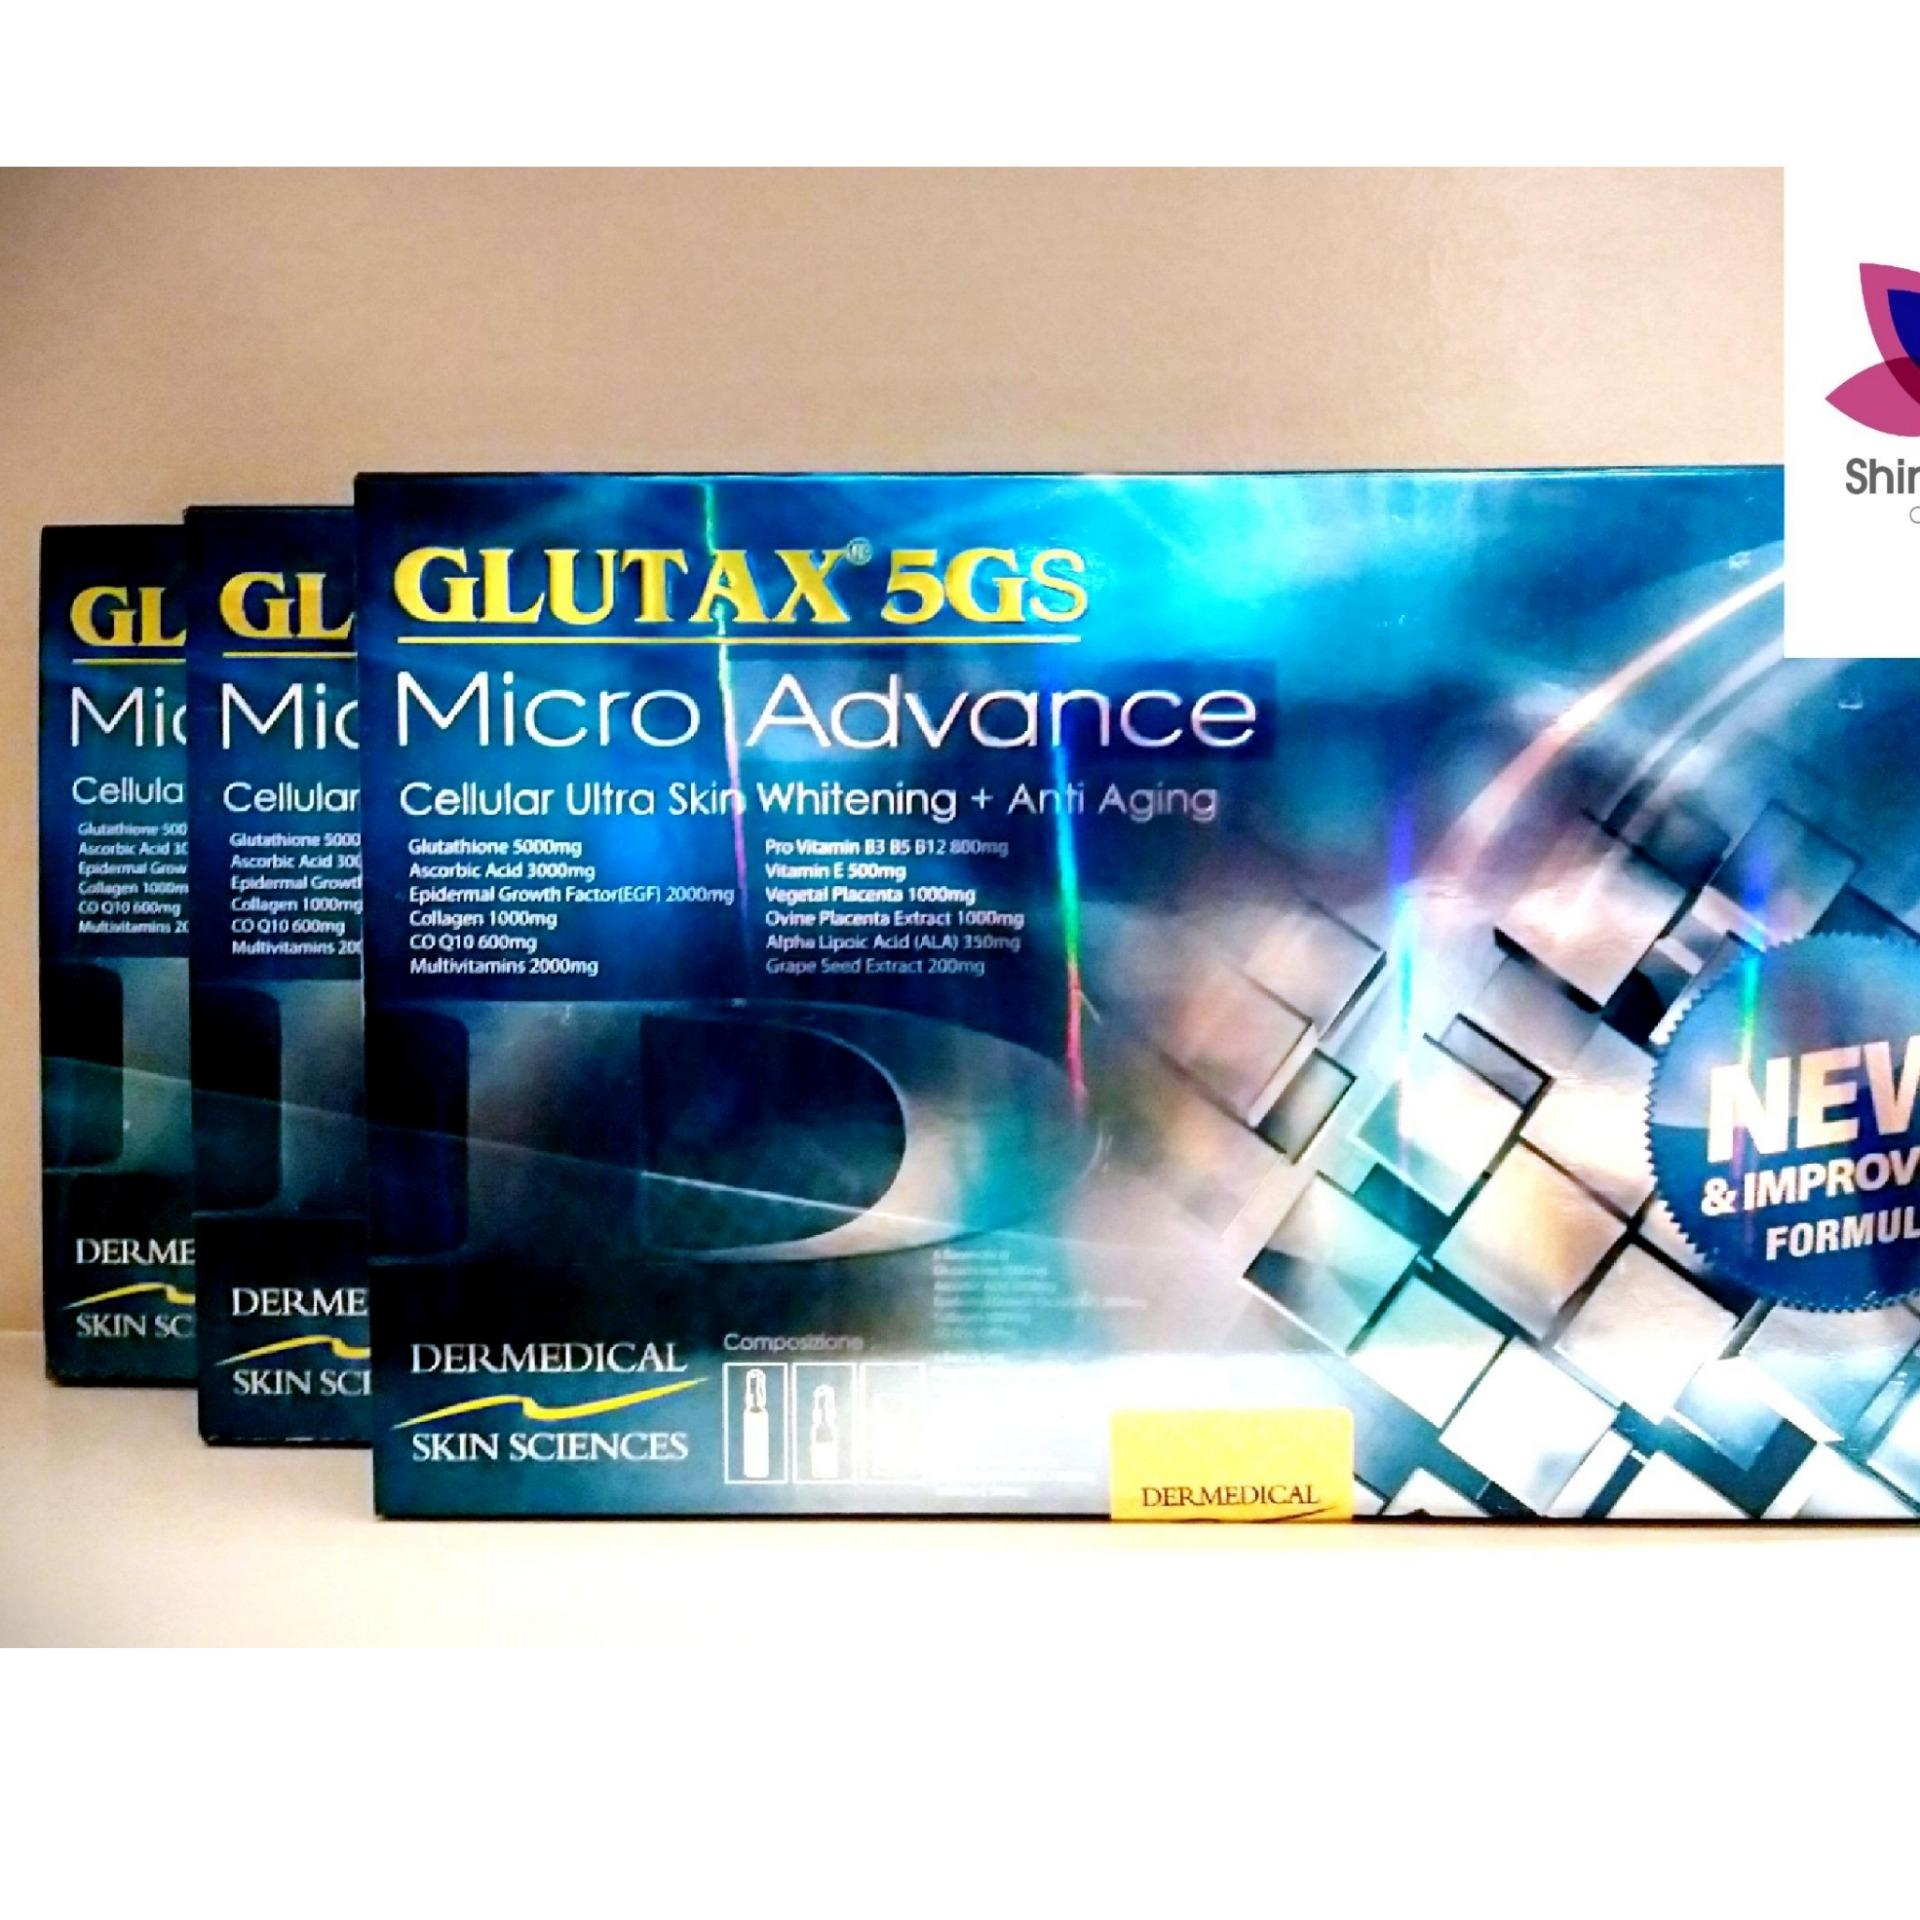 Sell Glutax Egf Whitening Cheapest Best Quality Ph Store 23000gk Php 7500